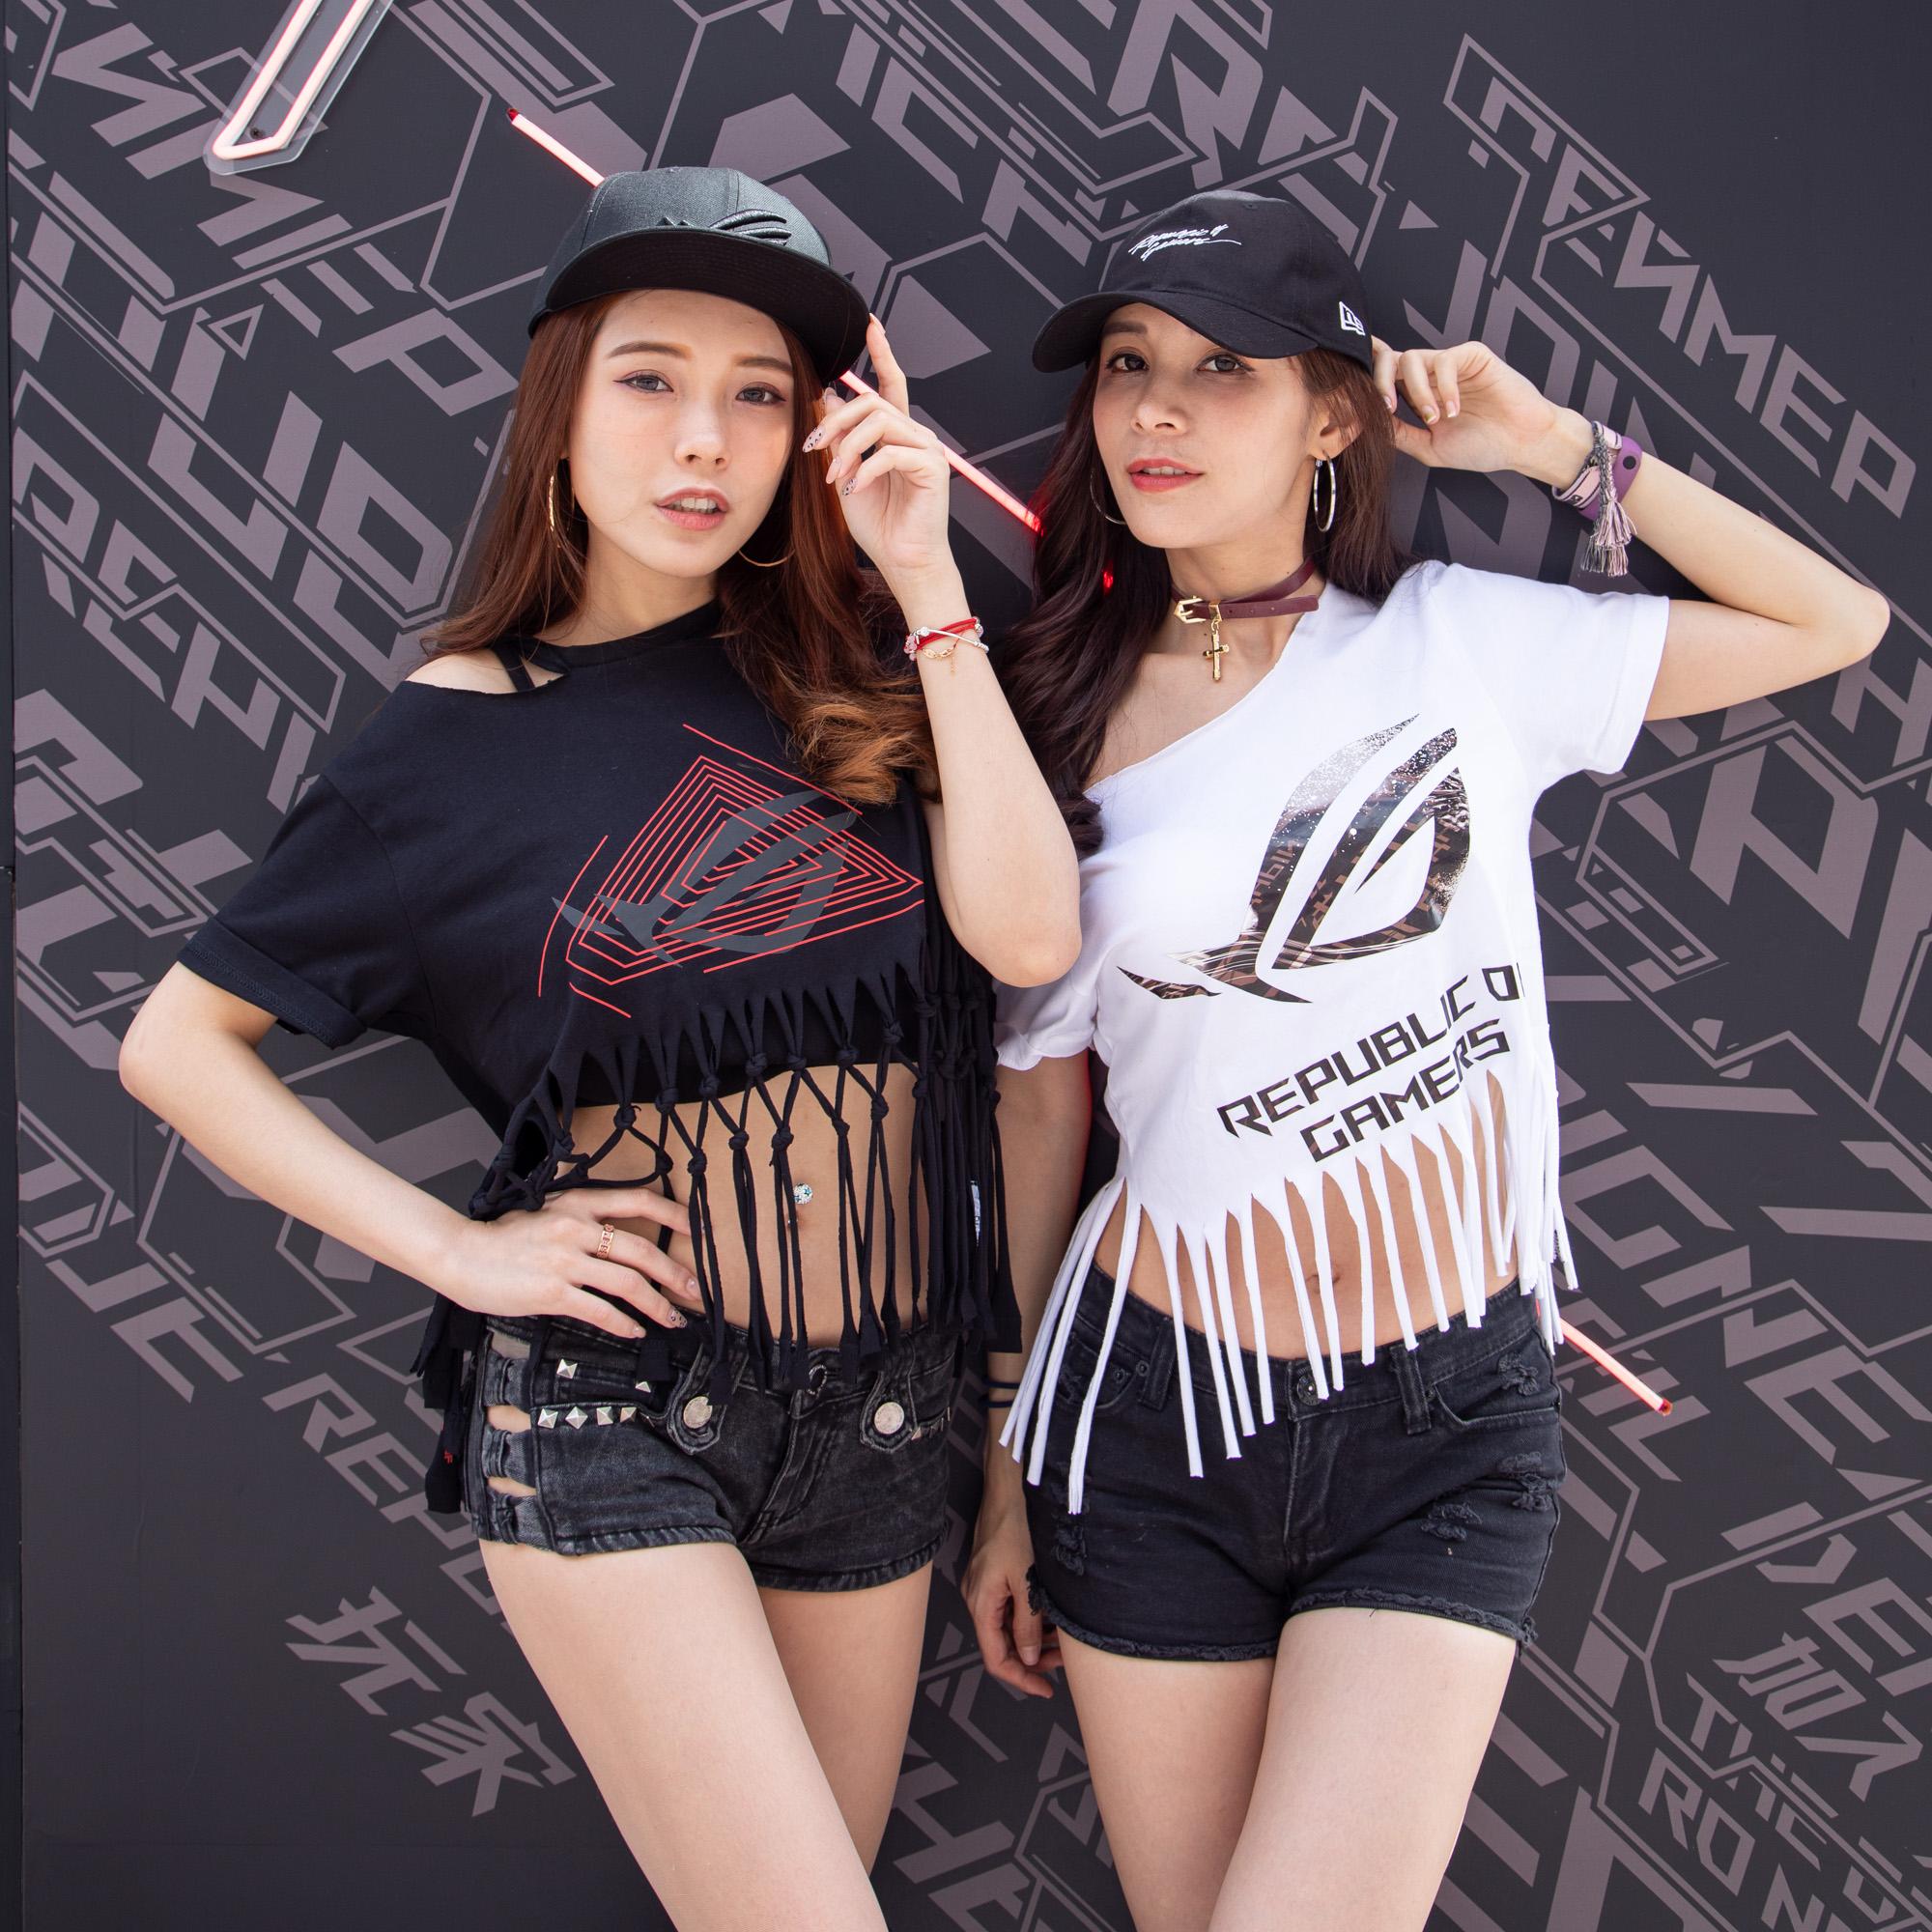 ROG玩家共和國在WirForce 2019推出與美式街頭潮牌New Era聯名設計的棒球帽,僅於展場限定販售,掀起粉絲搶購。